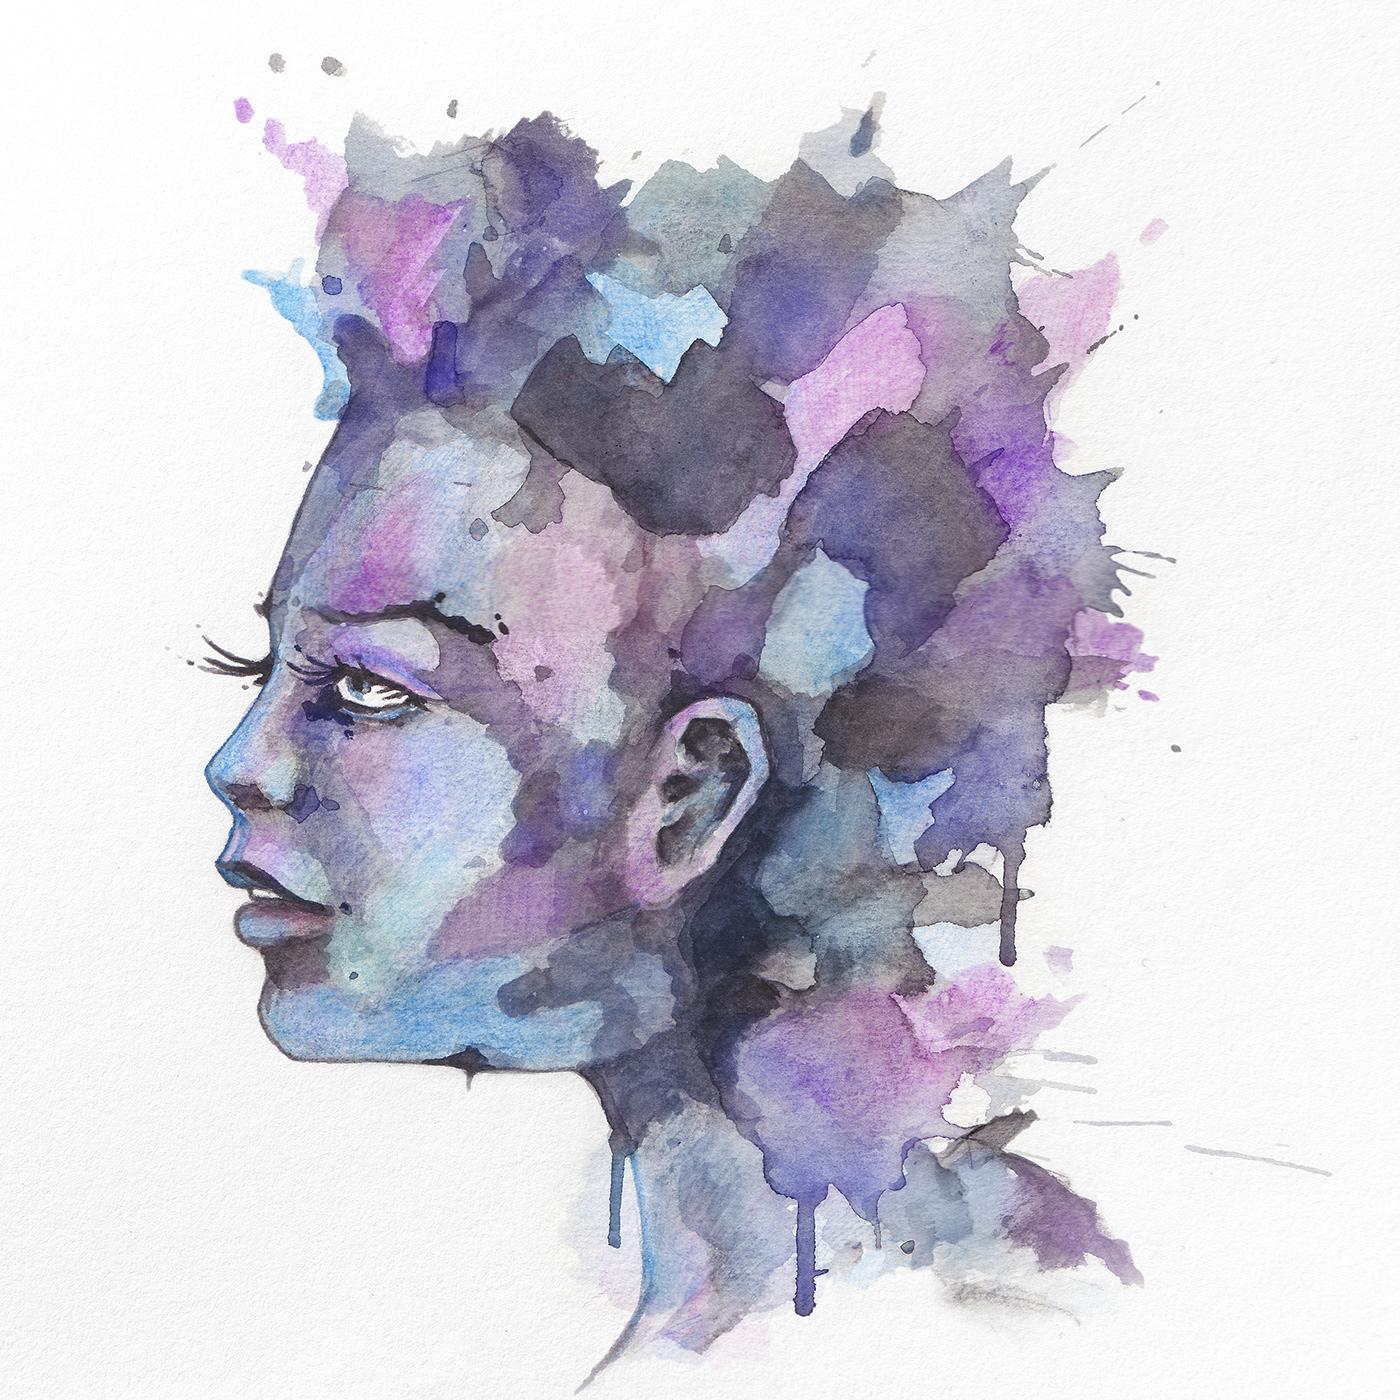 faces portraits vibrant watercolor woman artwork female beauty ILLUSTRATION